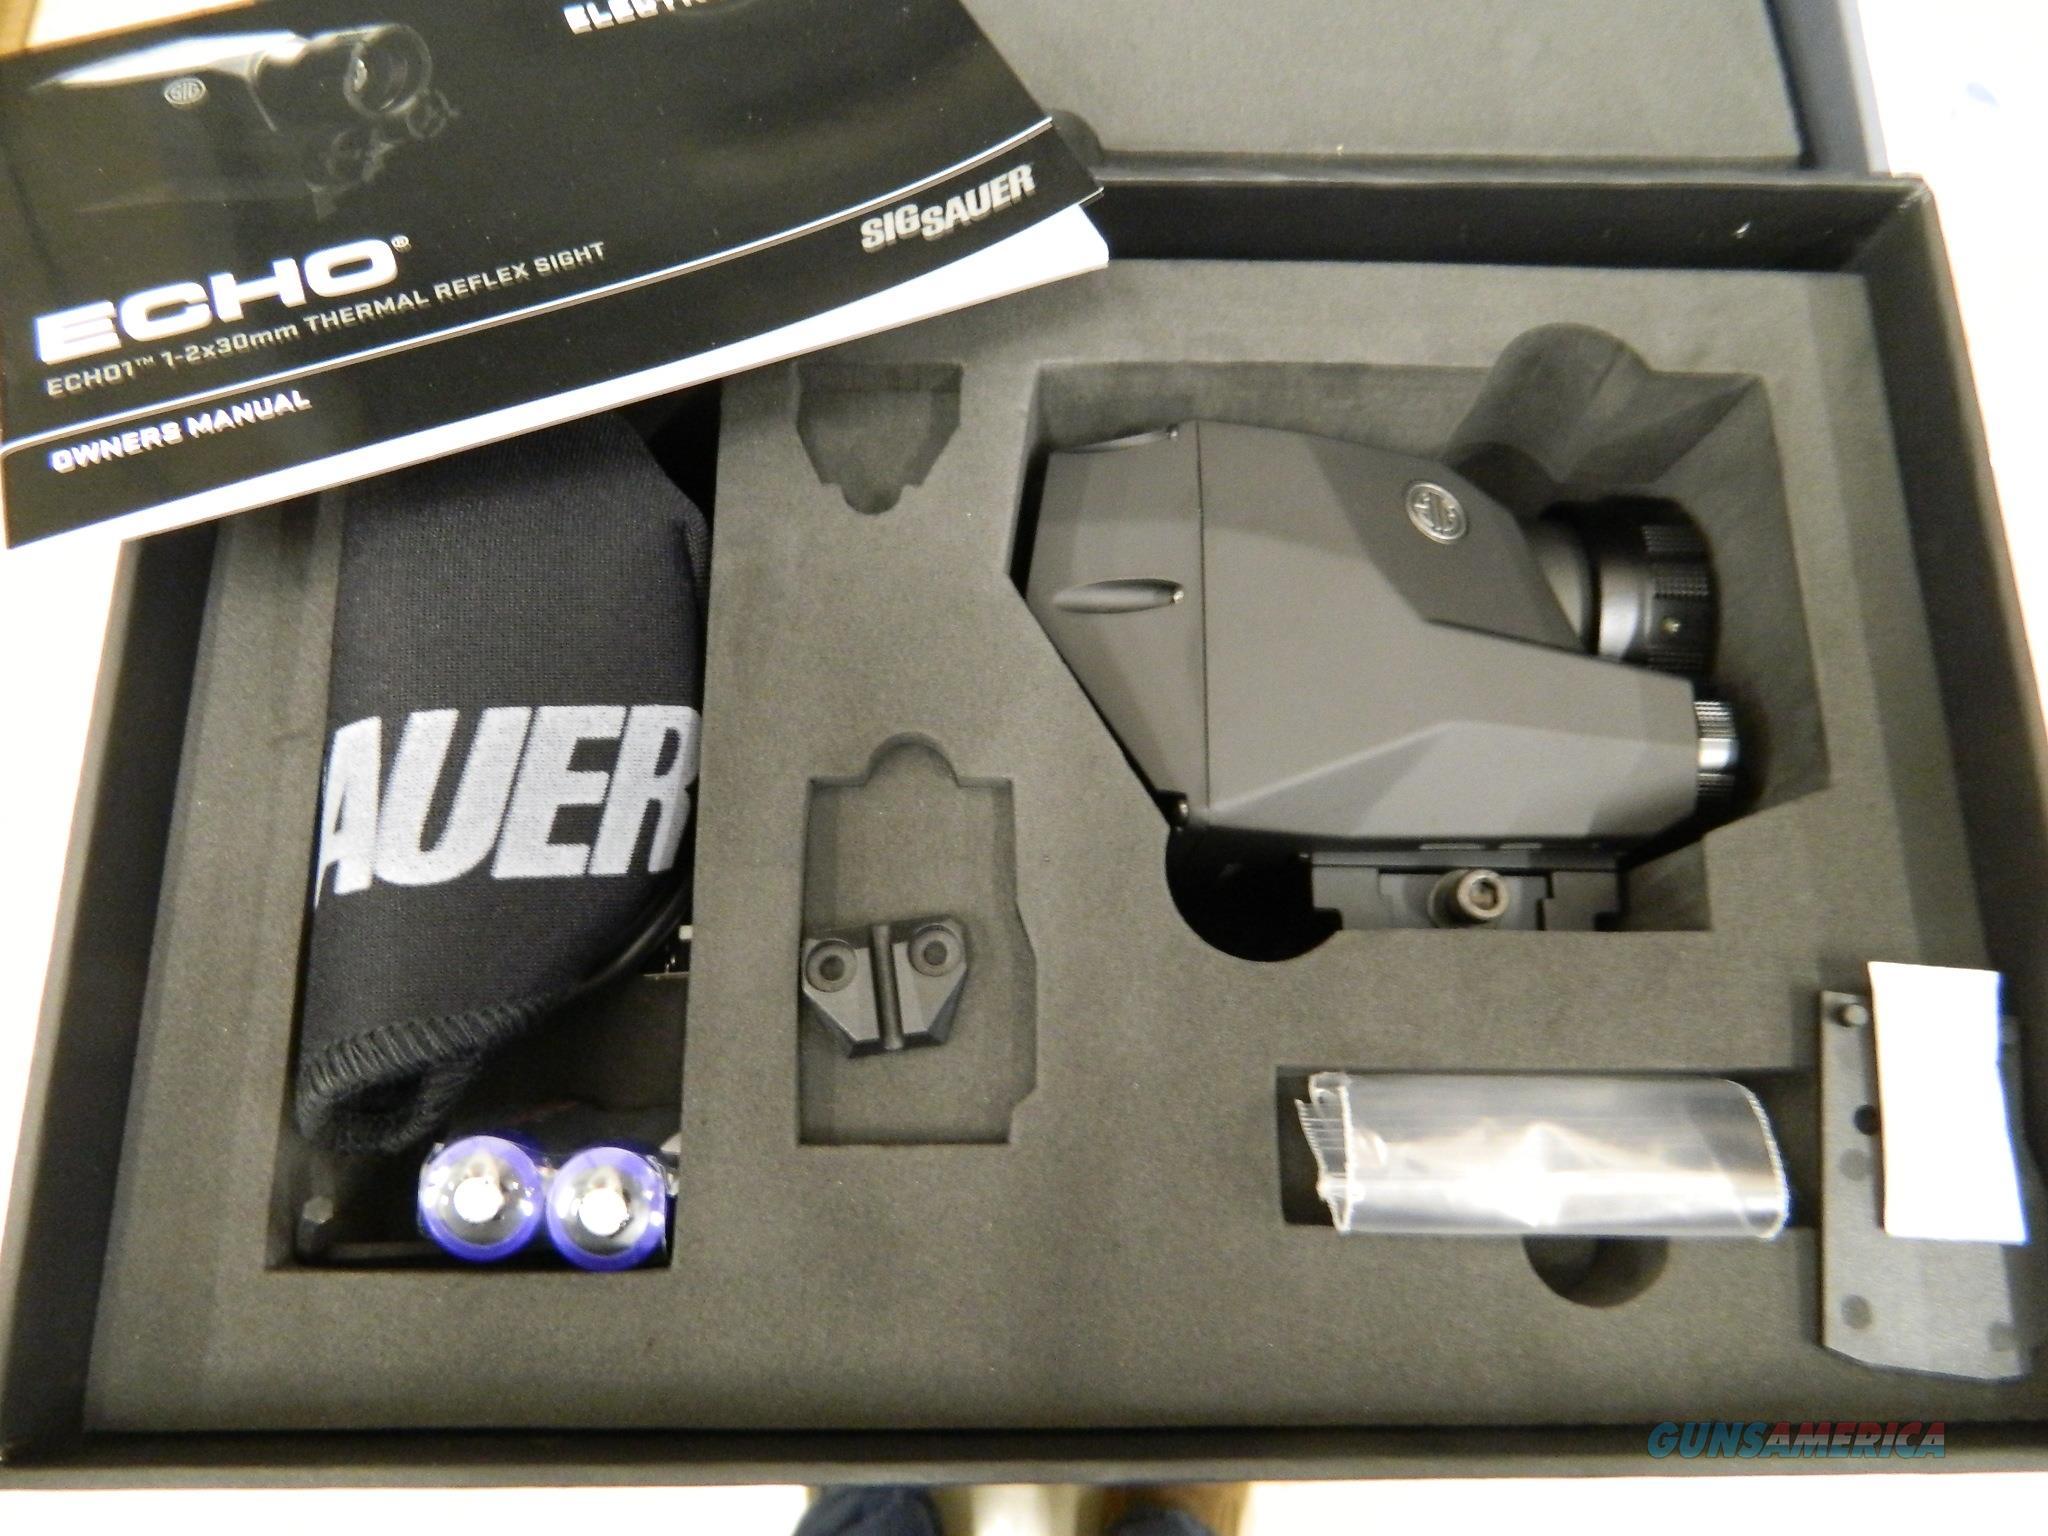 Sig Sauer ECHO1 Thermal Reflex Sight NIB  Non-Guns > Scopes/Mounts/Rings & Optics > Non-Scope Optics > Other